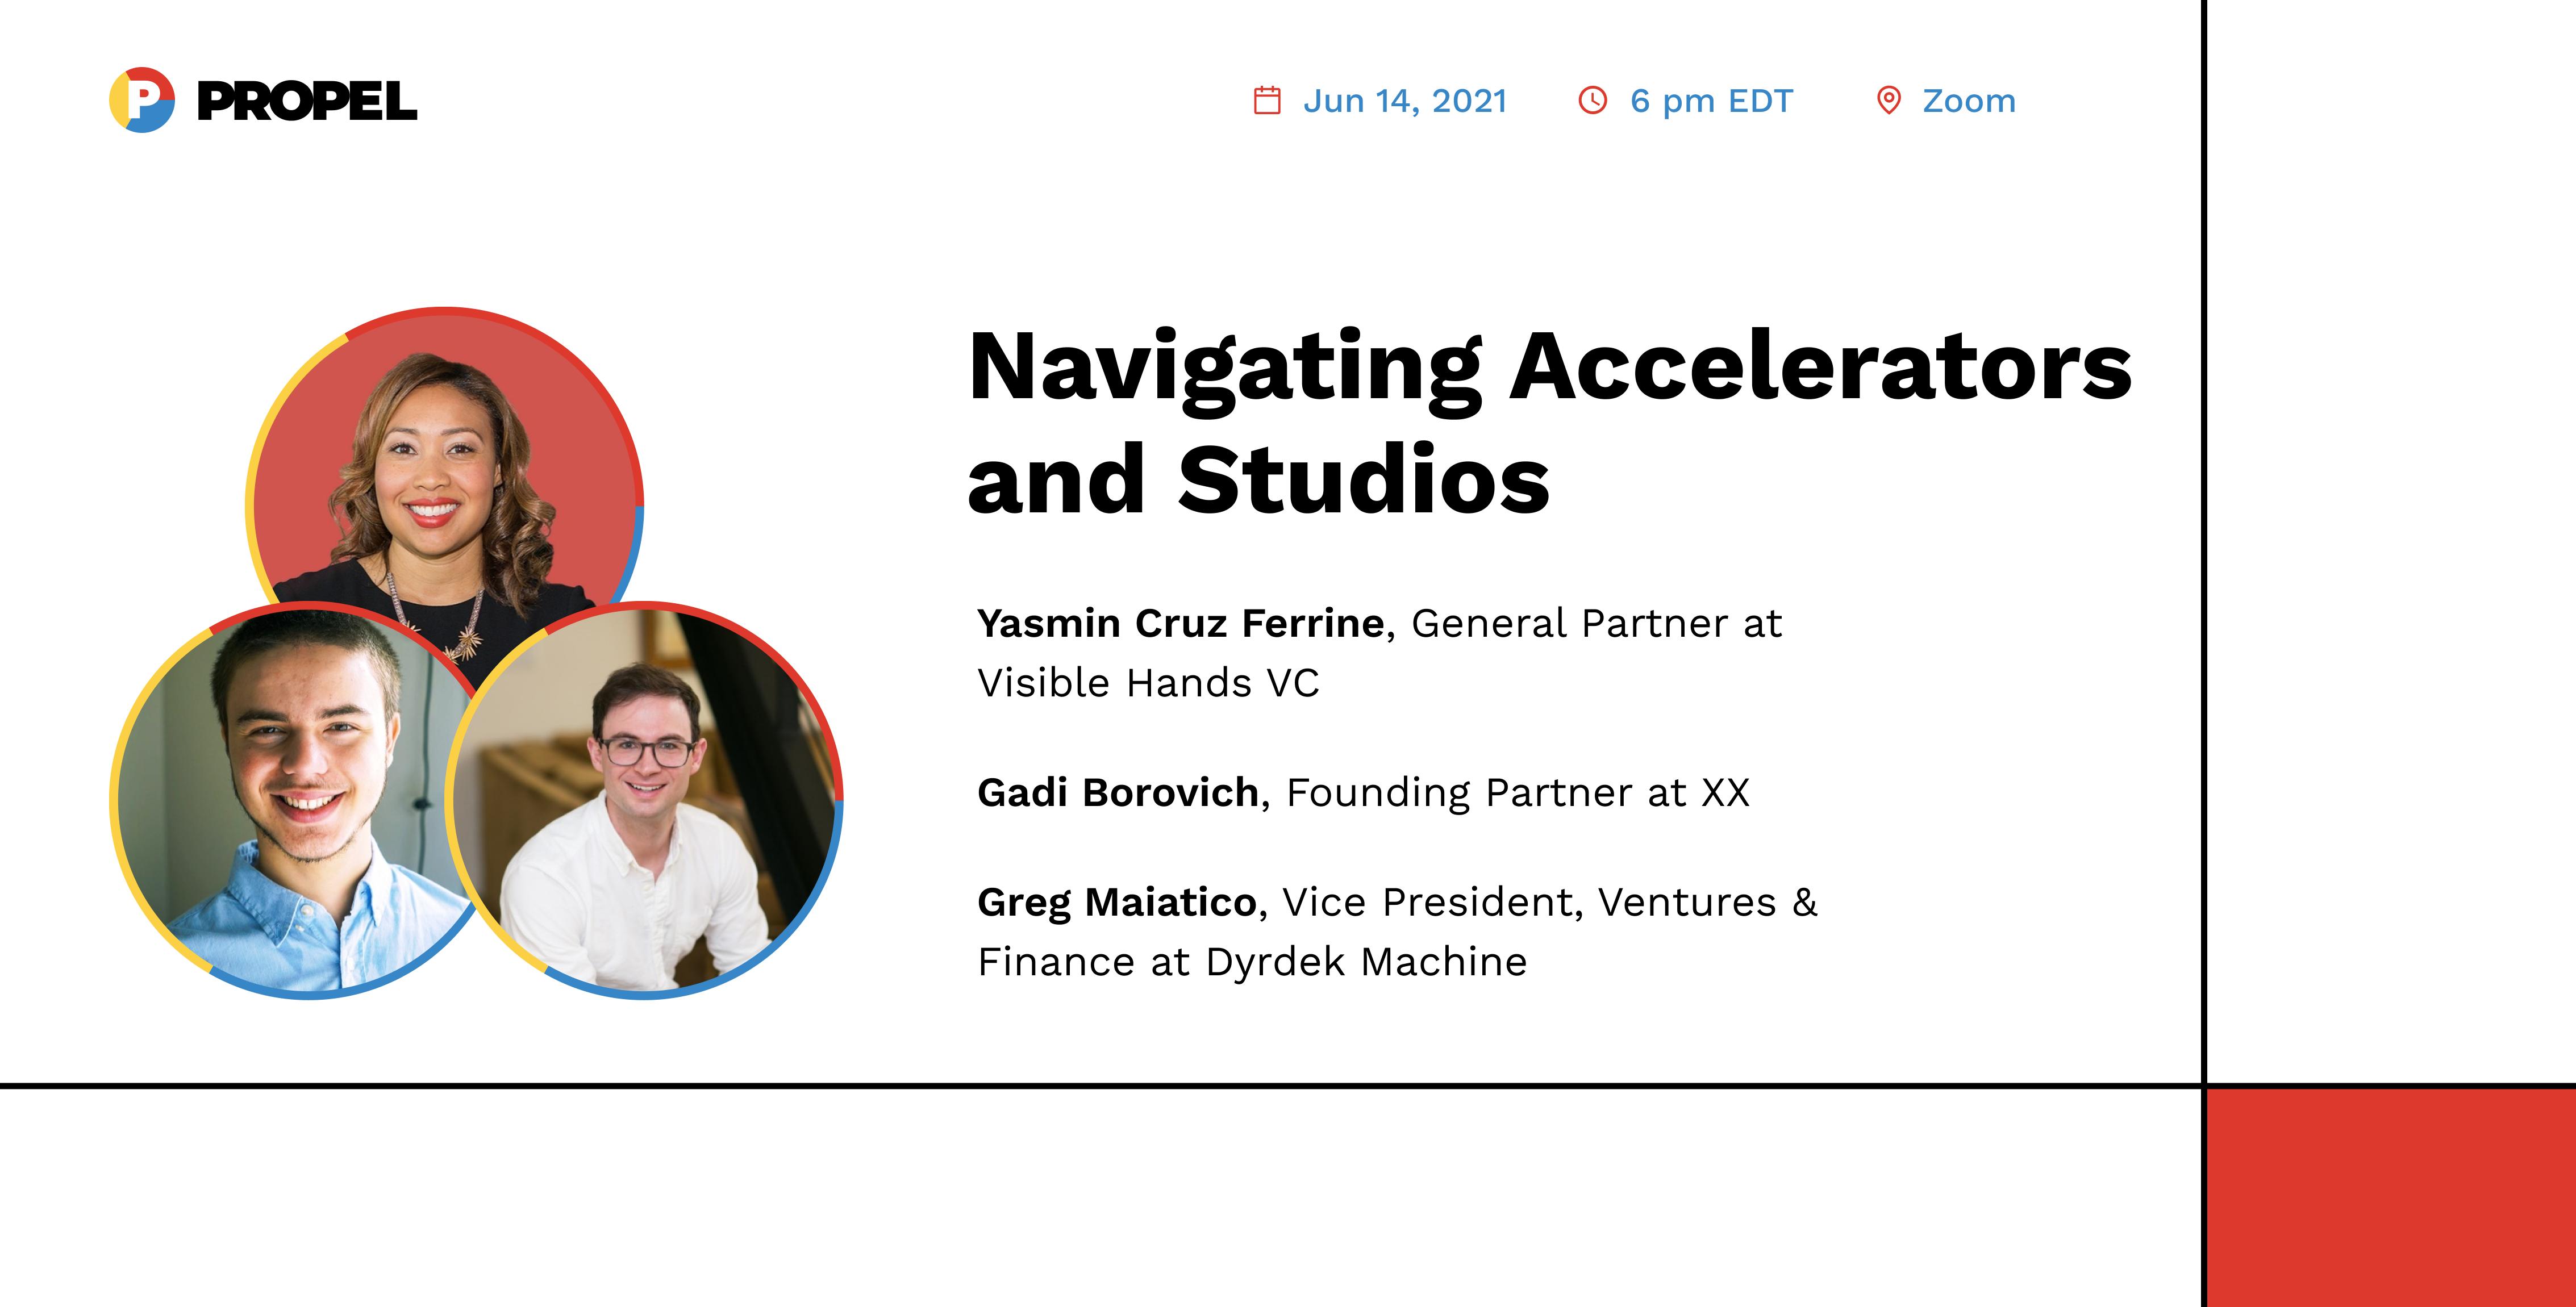 Navigating accelerators and studios with Yasmin Cruz Ferrine from Visible Hands, Gadi Borovich from XX, and Greg Maiatico from Dyrdek Machine